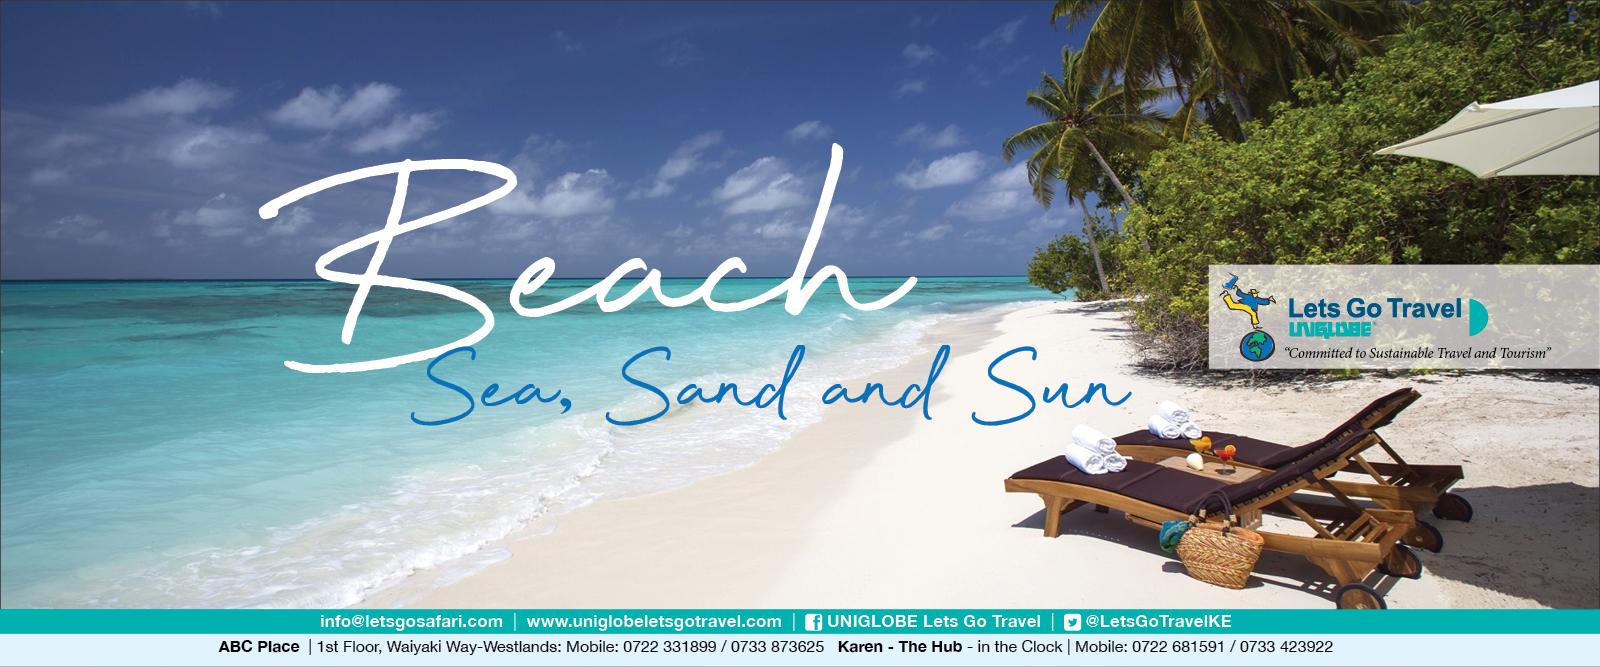 Lets Go Travel - THE Beach, Sea, Sand and Sun Specialist across East Africa!